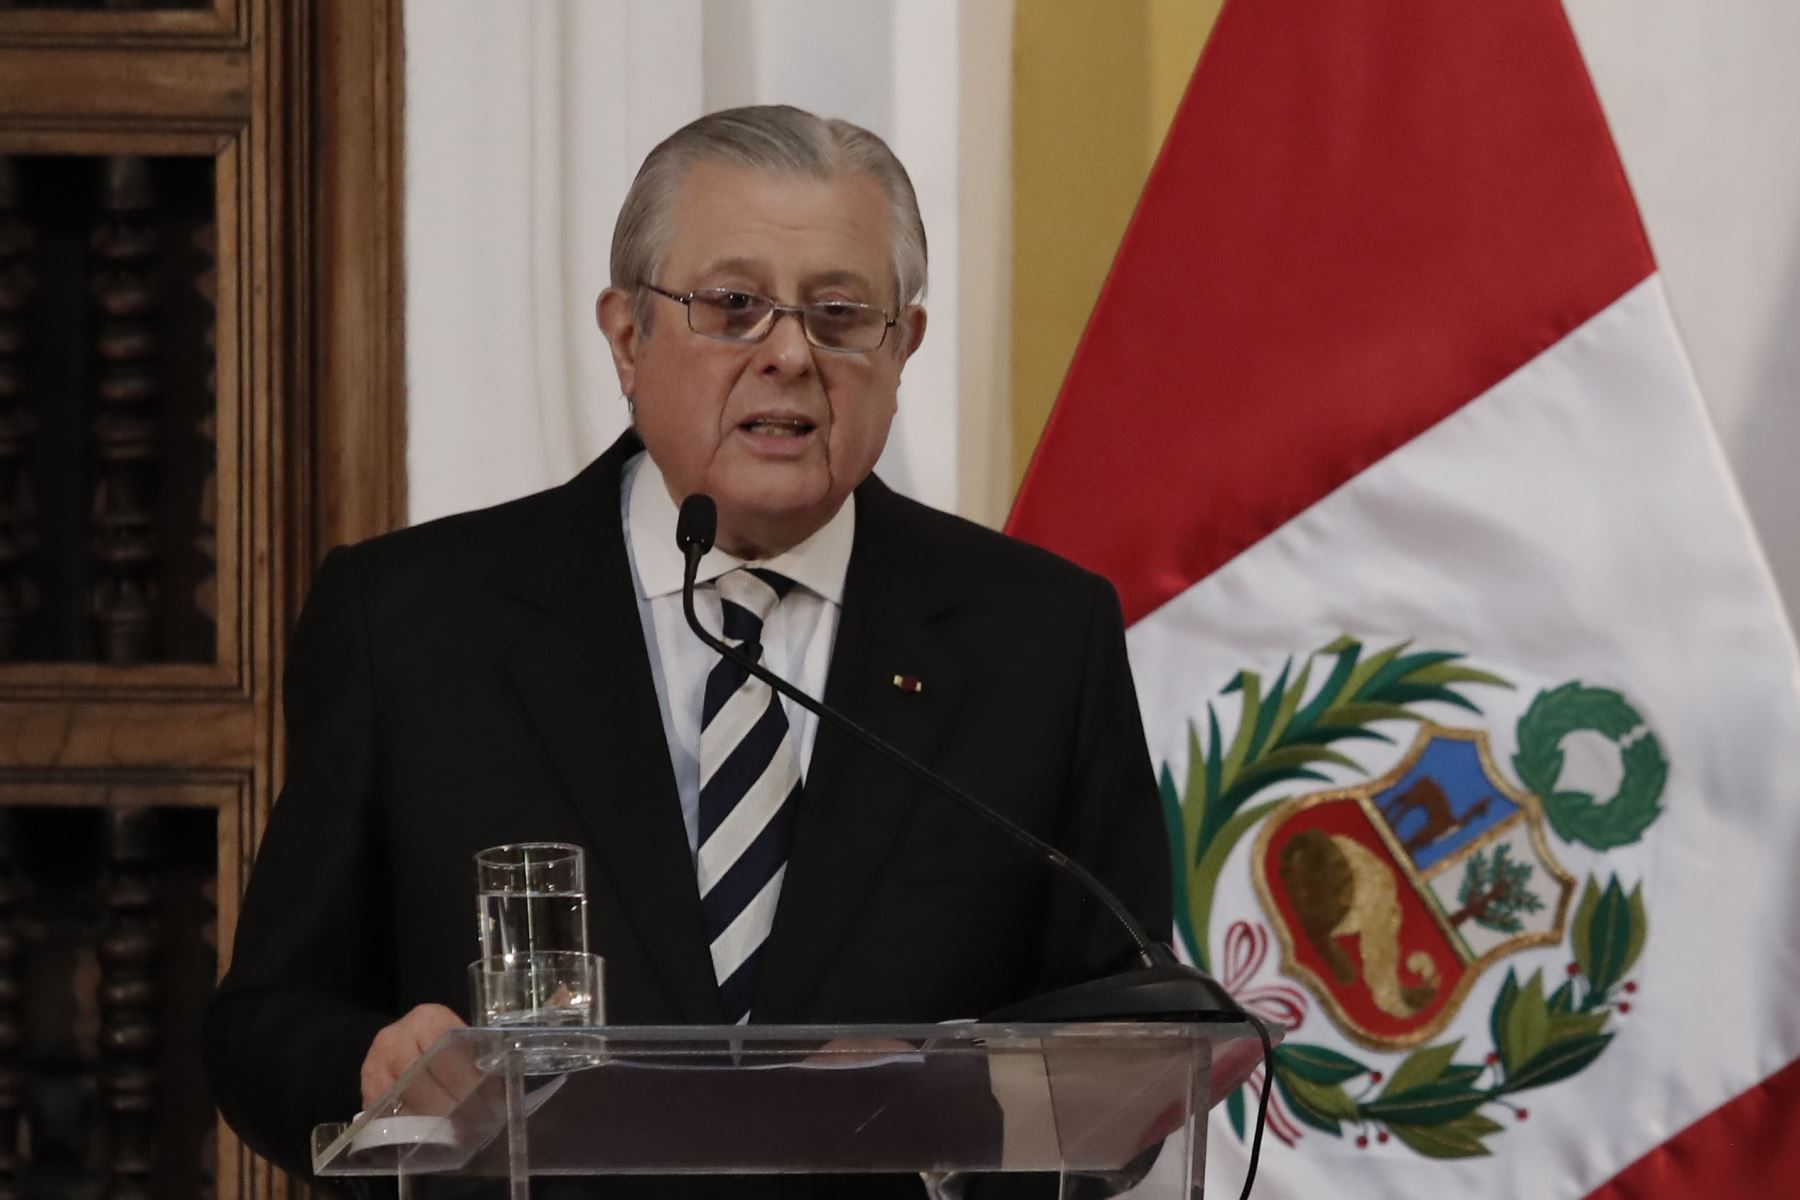 Perú ratifica compromiso de fortalecer asociación estratégica con China